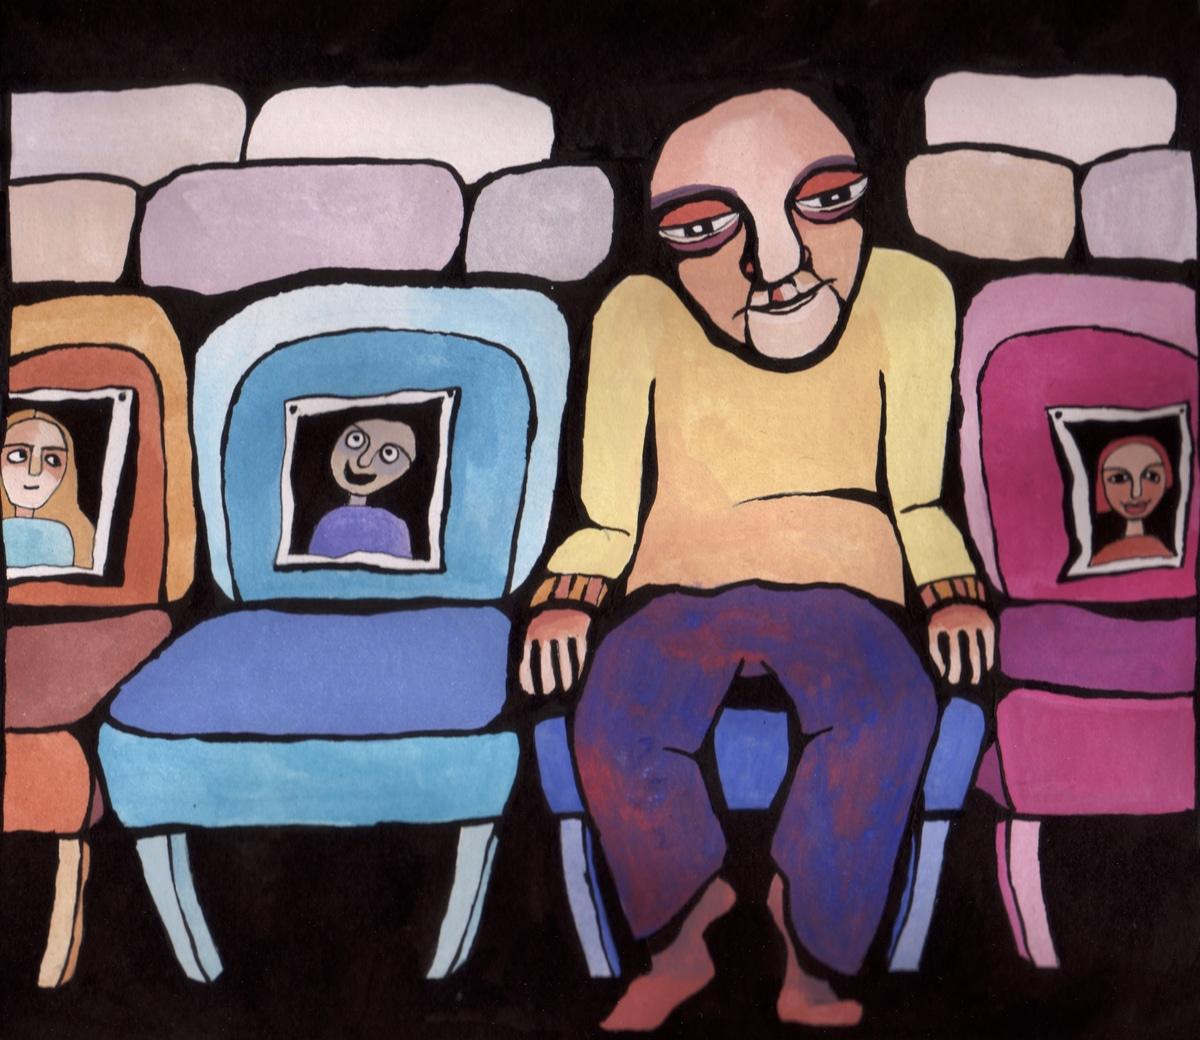 Meine Freunde. Mani draugi. Ieva Kunga. 2004